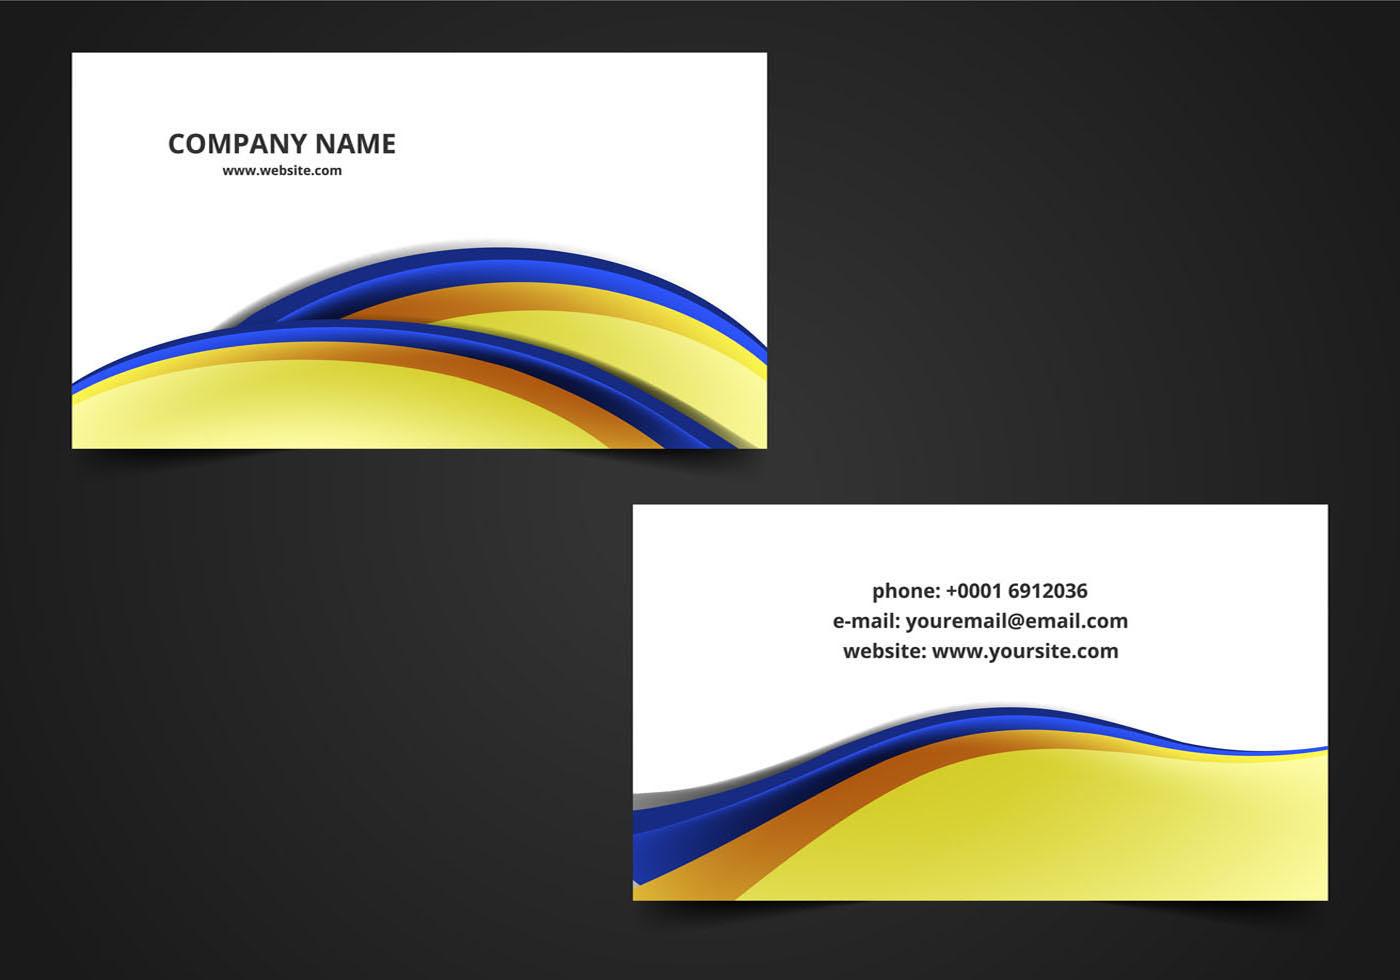 free vector abstract visiting card  download free vector